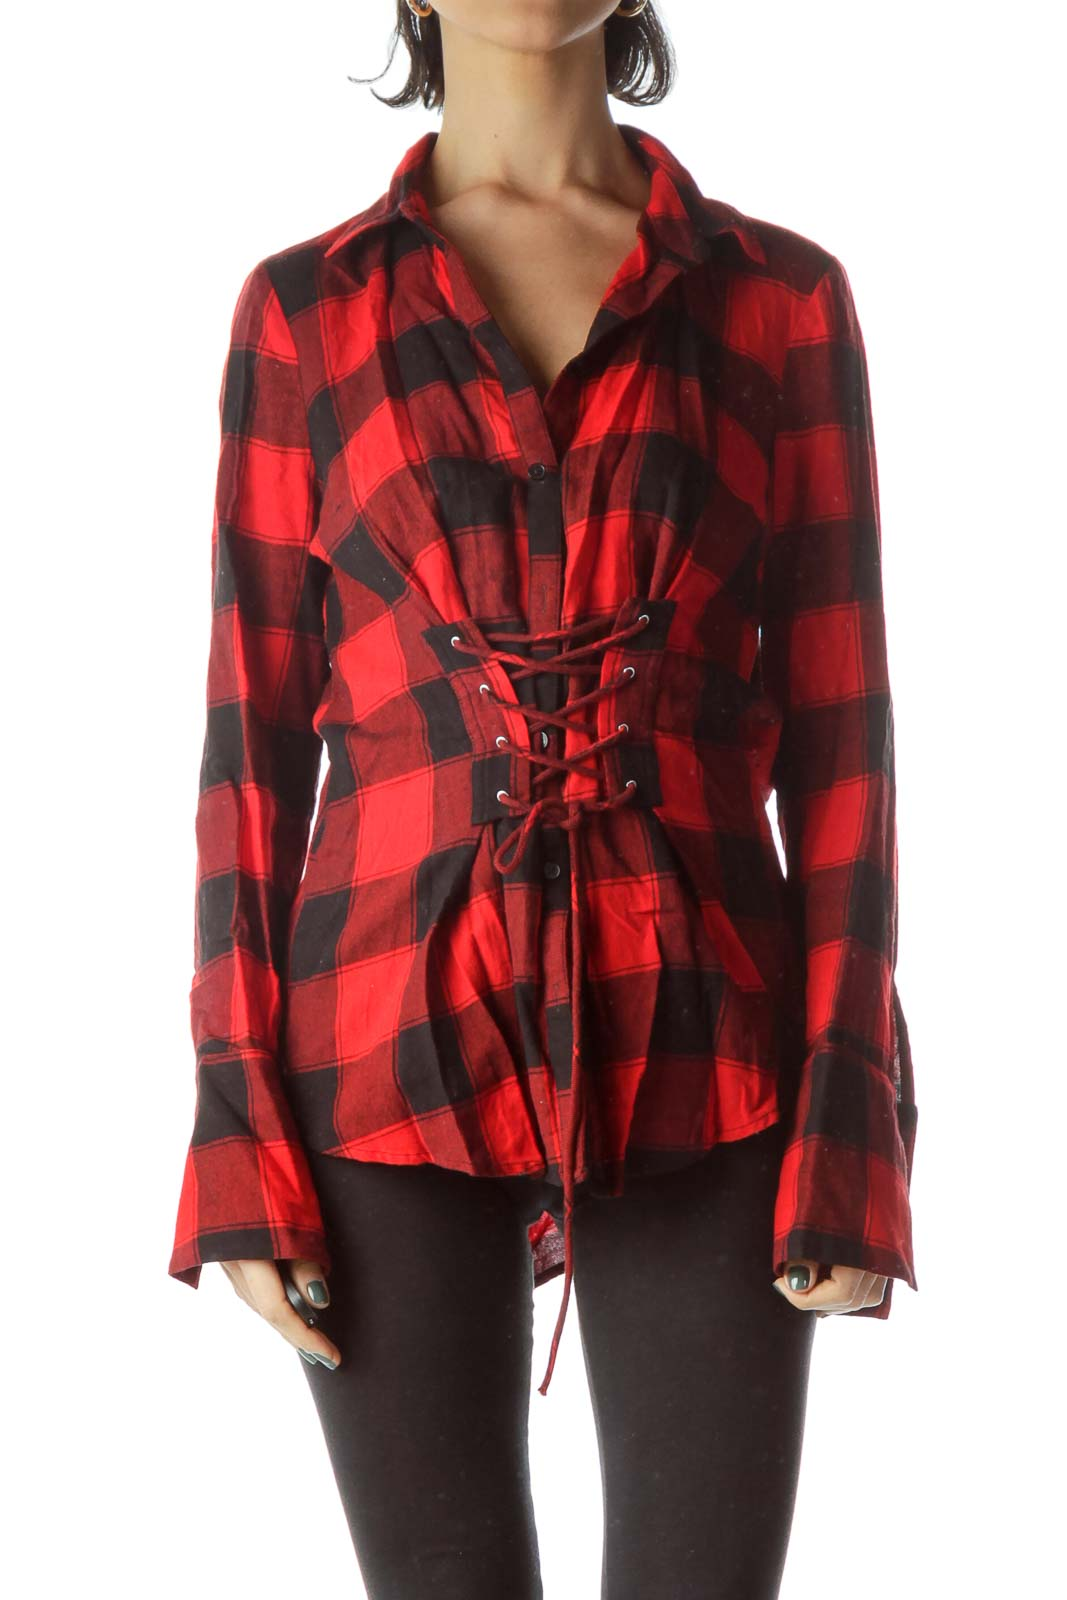 Red Black Checkered 100% Cotton Drawstring Shirt